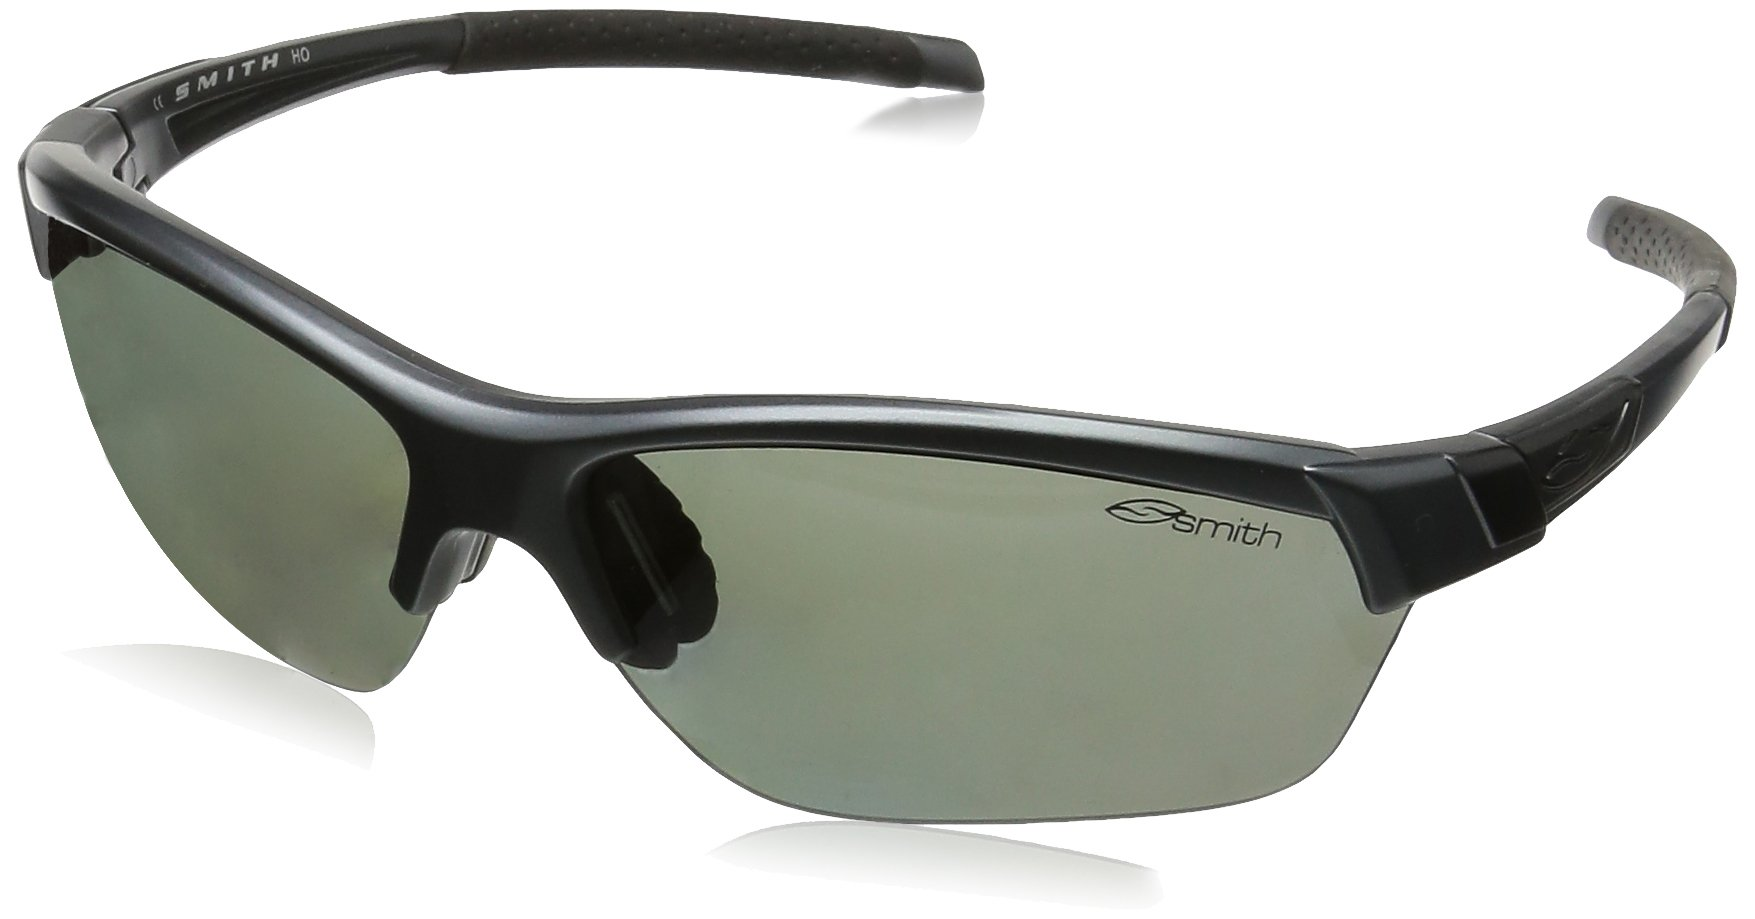 Smith Optics Approach Max (NEW) Sunglasses, Matte Graphite, Polarized Platinum/Ignitor/Clear